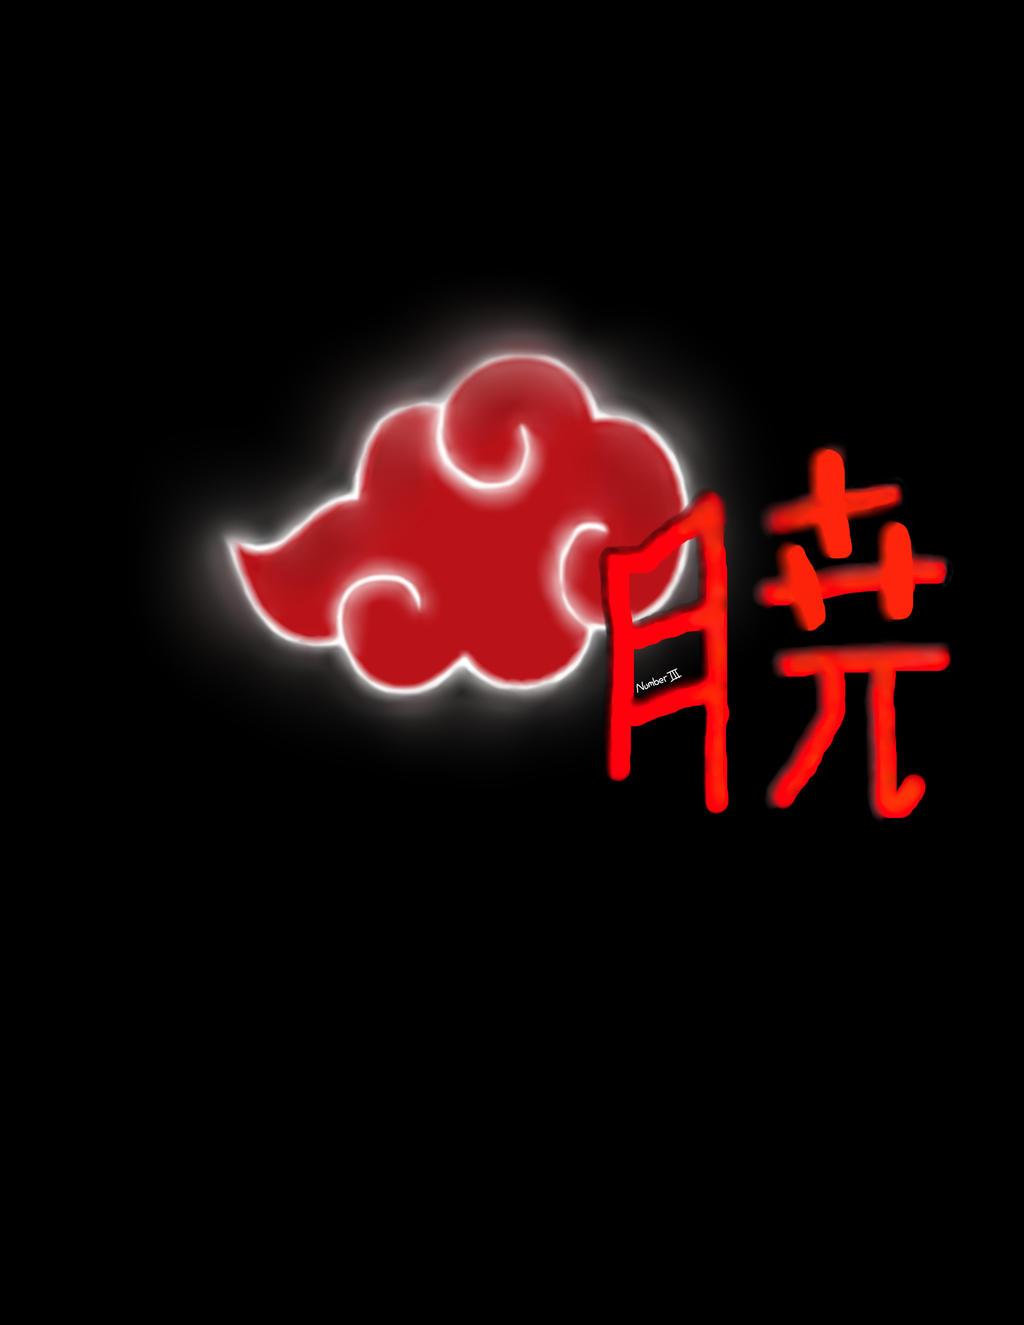 Akatsuki cloud by NumberIII on DeviantArt